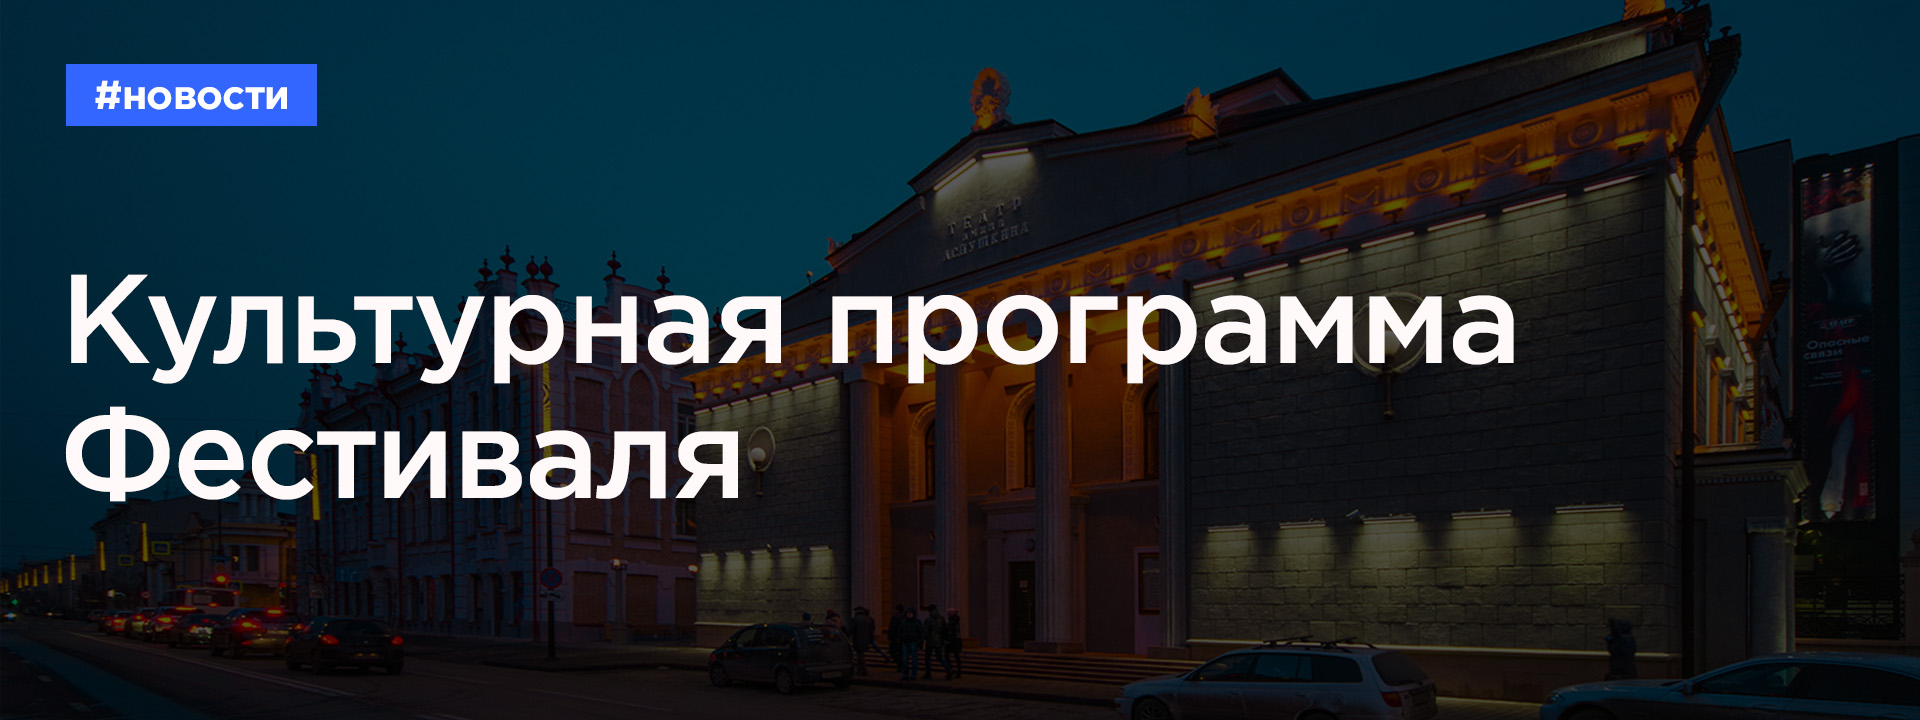 Kulturnaya_programma_YaRpiara